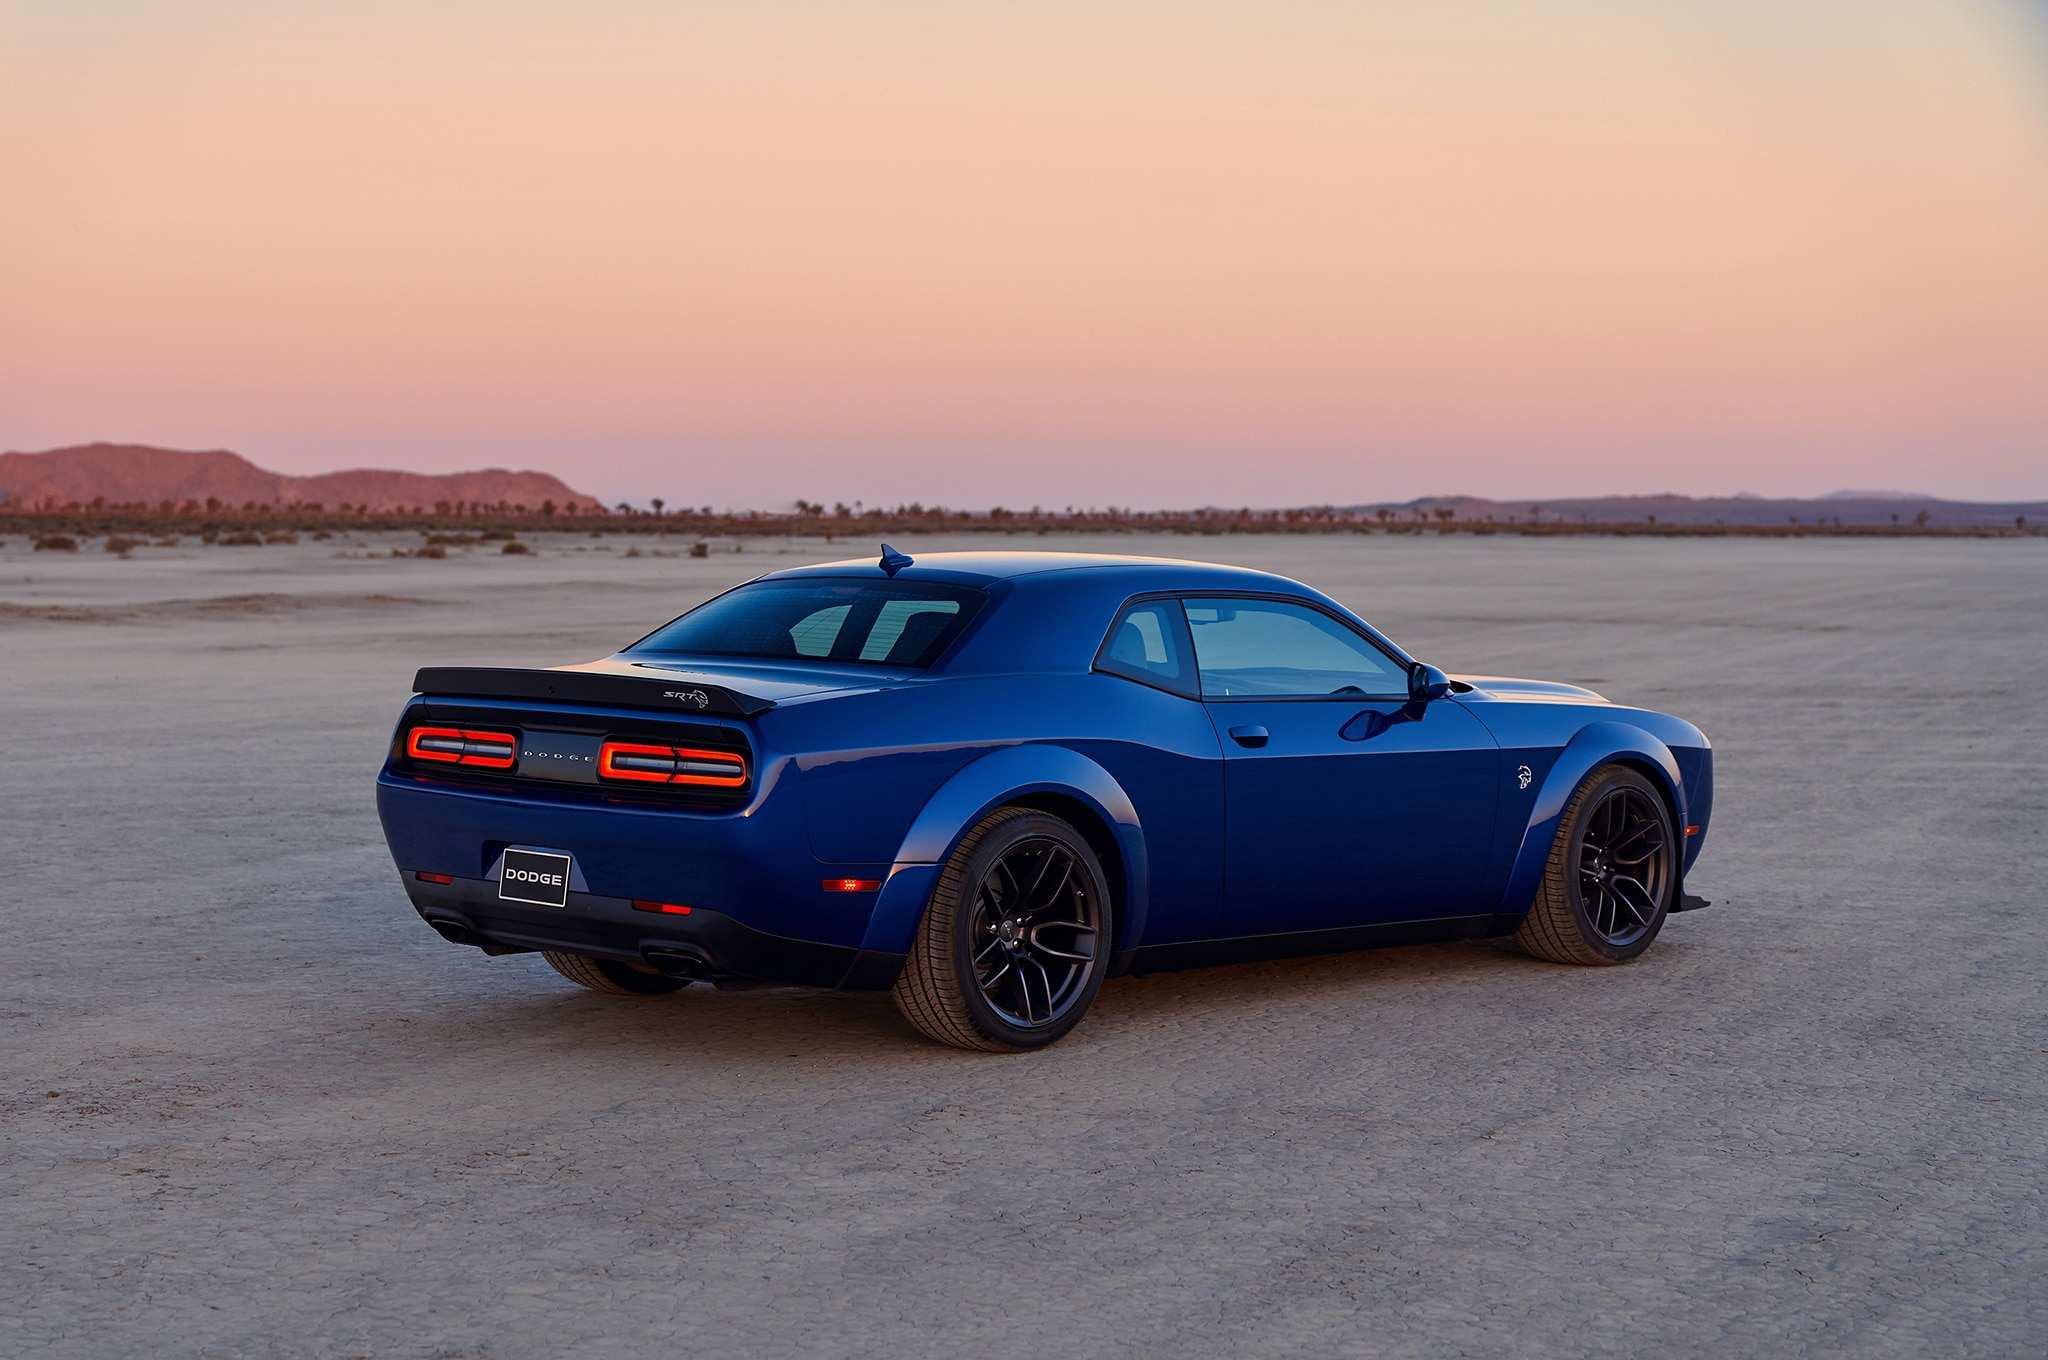 98 Concept of 2019 Dodge Challenger Srt Configurations with 2019 Dodge Challenger Srt